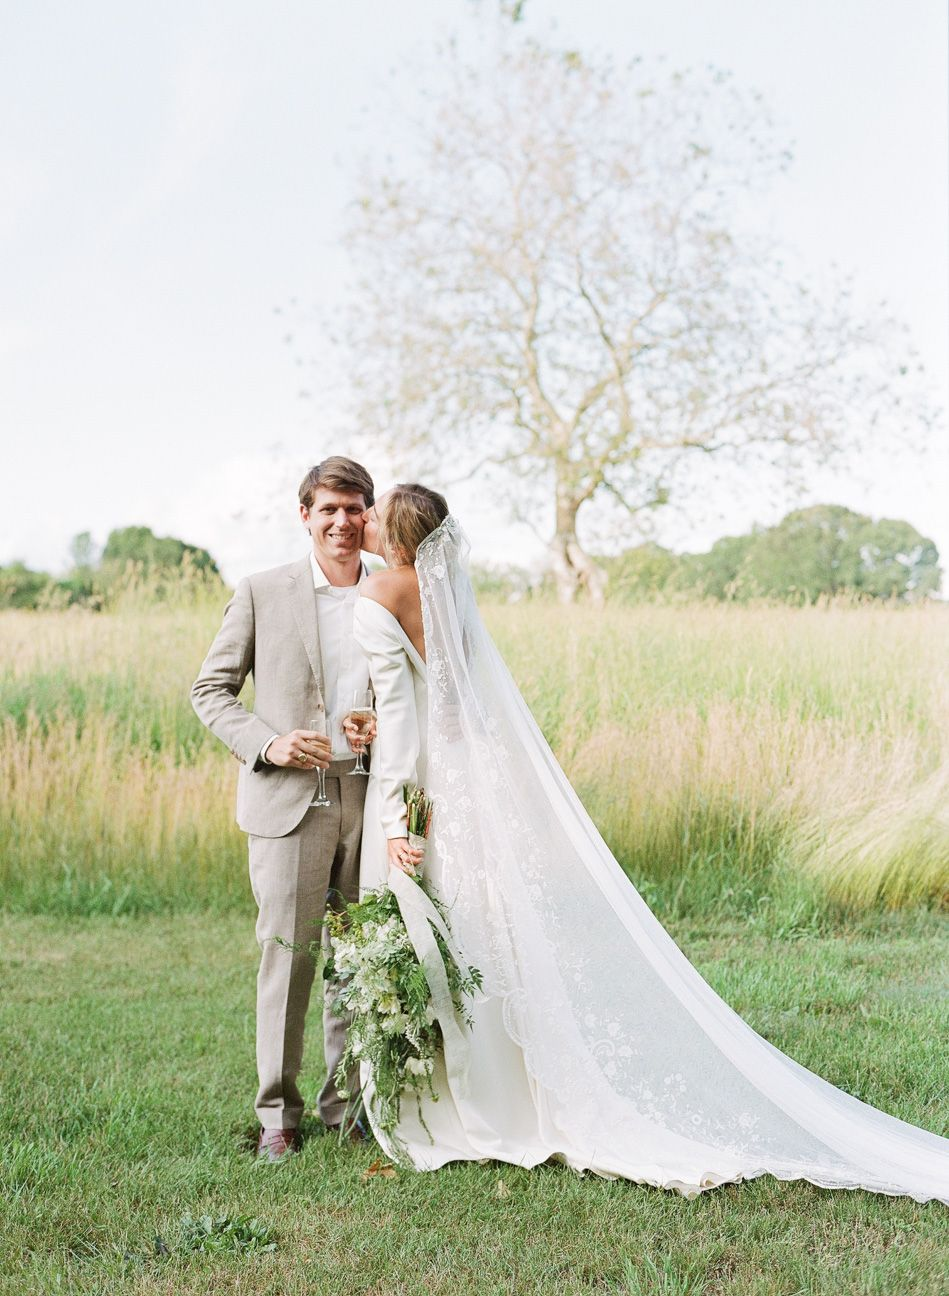 KareHillPhotography-Nassikas-Wedding-0748.jpg